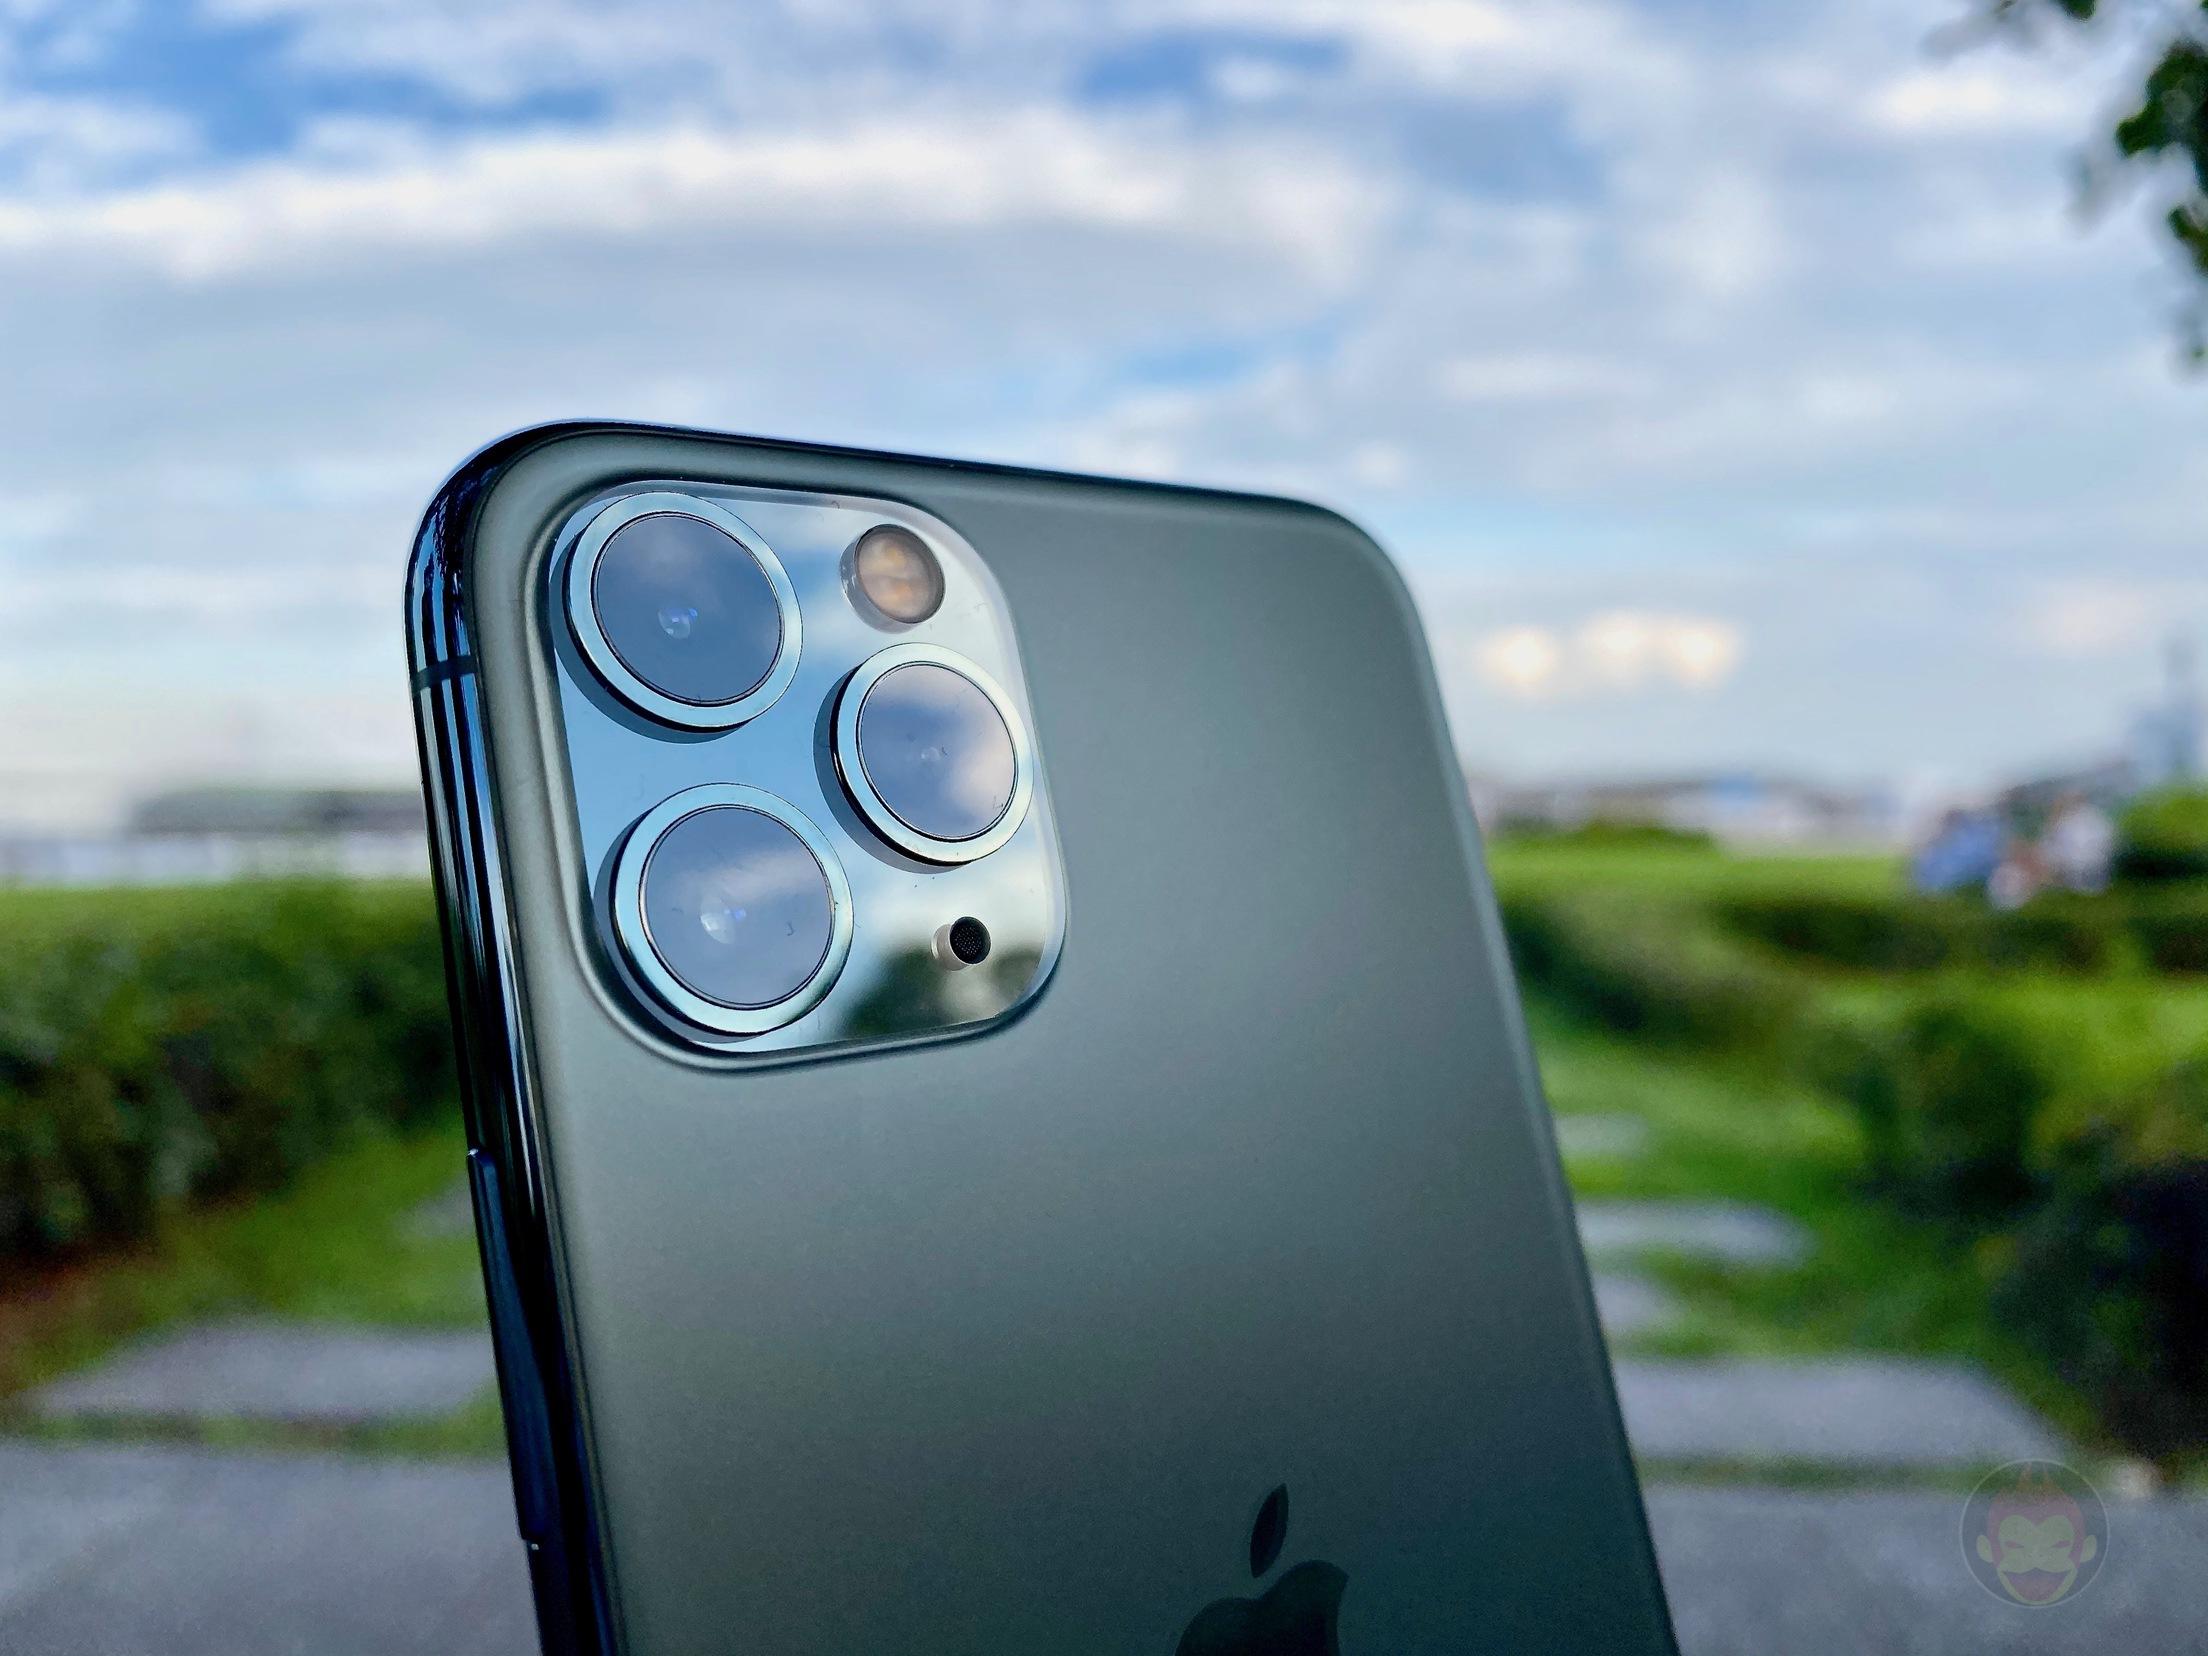 iPhone-11-Pro-mIdnight-Green-Model-First-Impressions-06.jpg